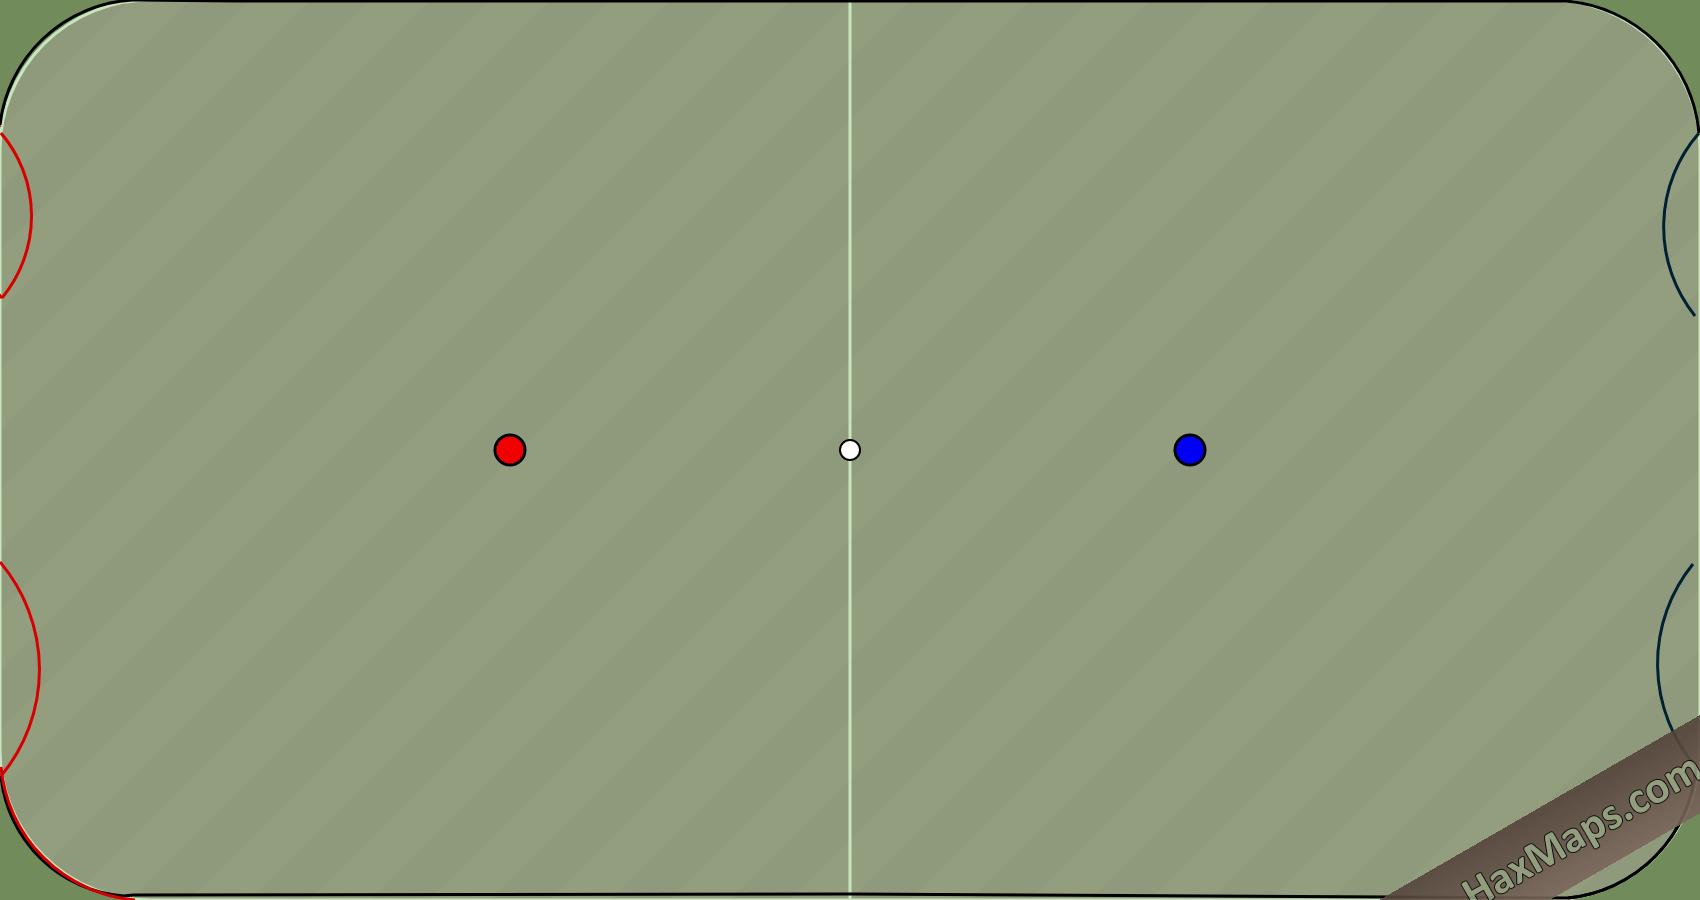 hax ball maps | Huge 4v4 Real Soccer by RU